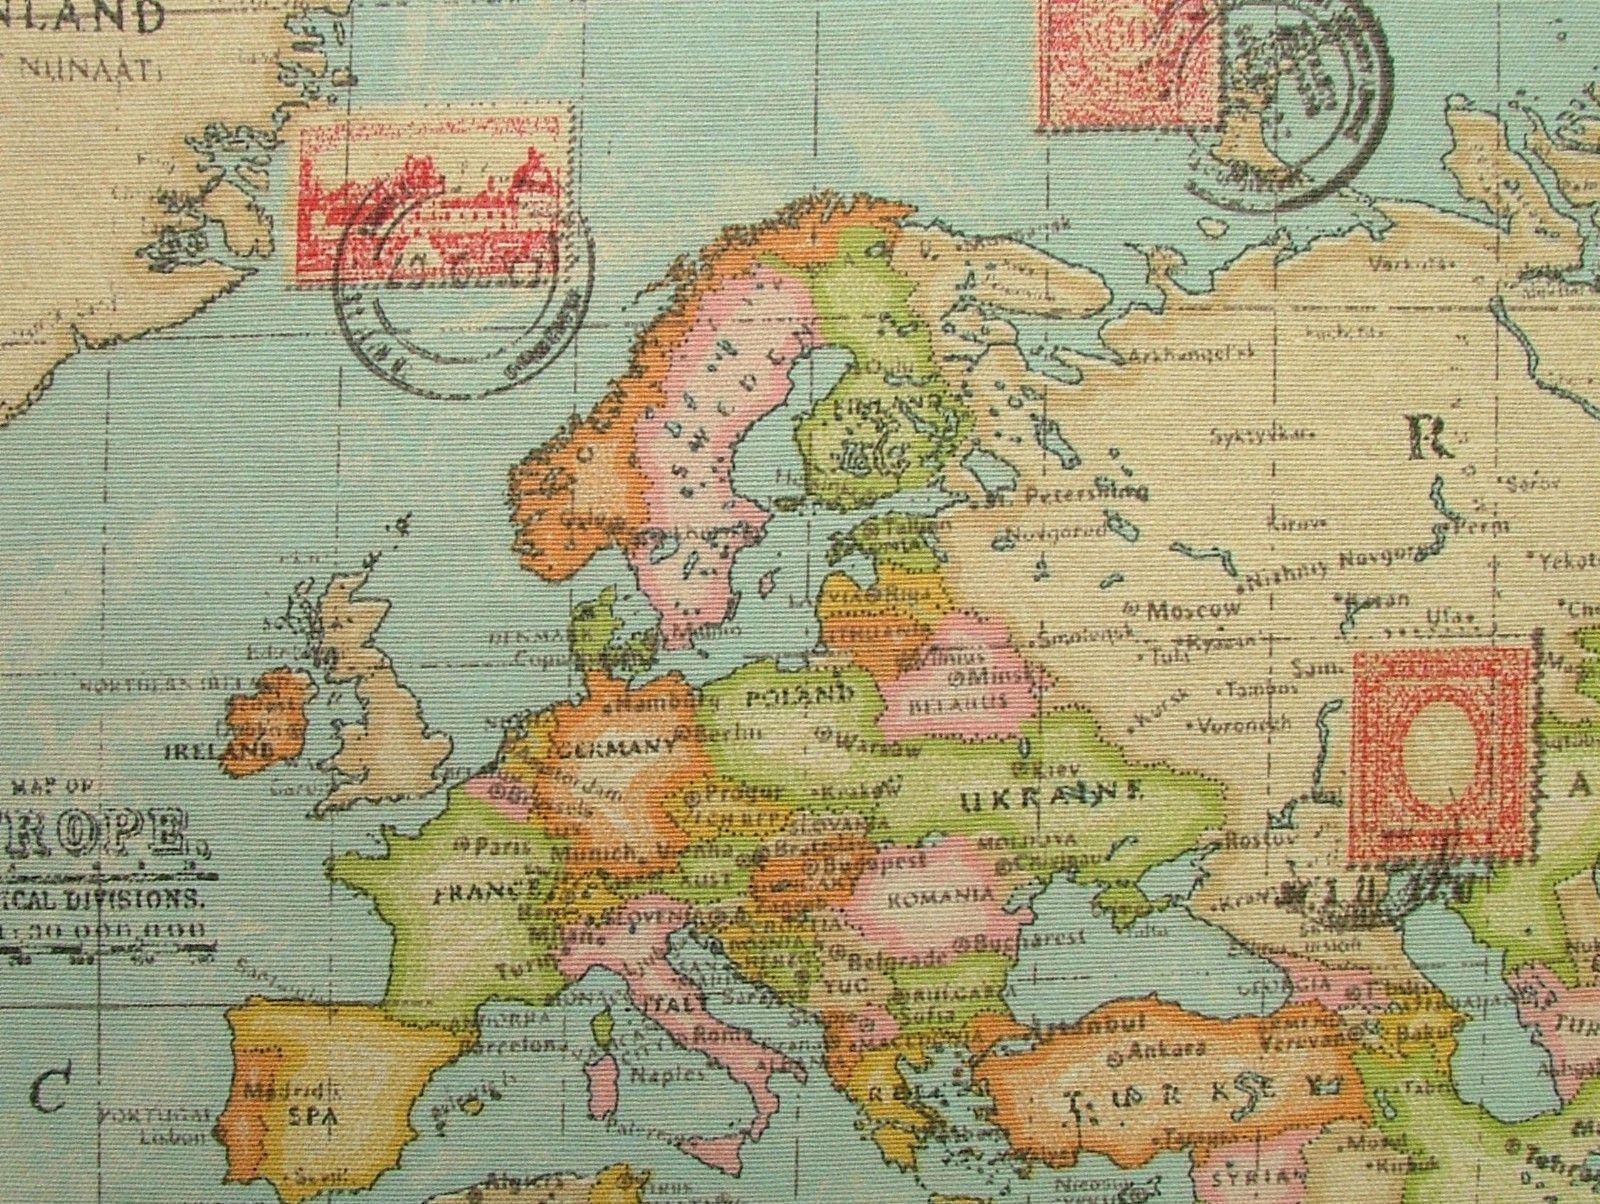 Blue atlas world globe map cotton linen fabric curtain blinds blue atlas world globe map cotton linen fabric curtain blinds craft quiltin 2 gumiabroncs Images